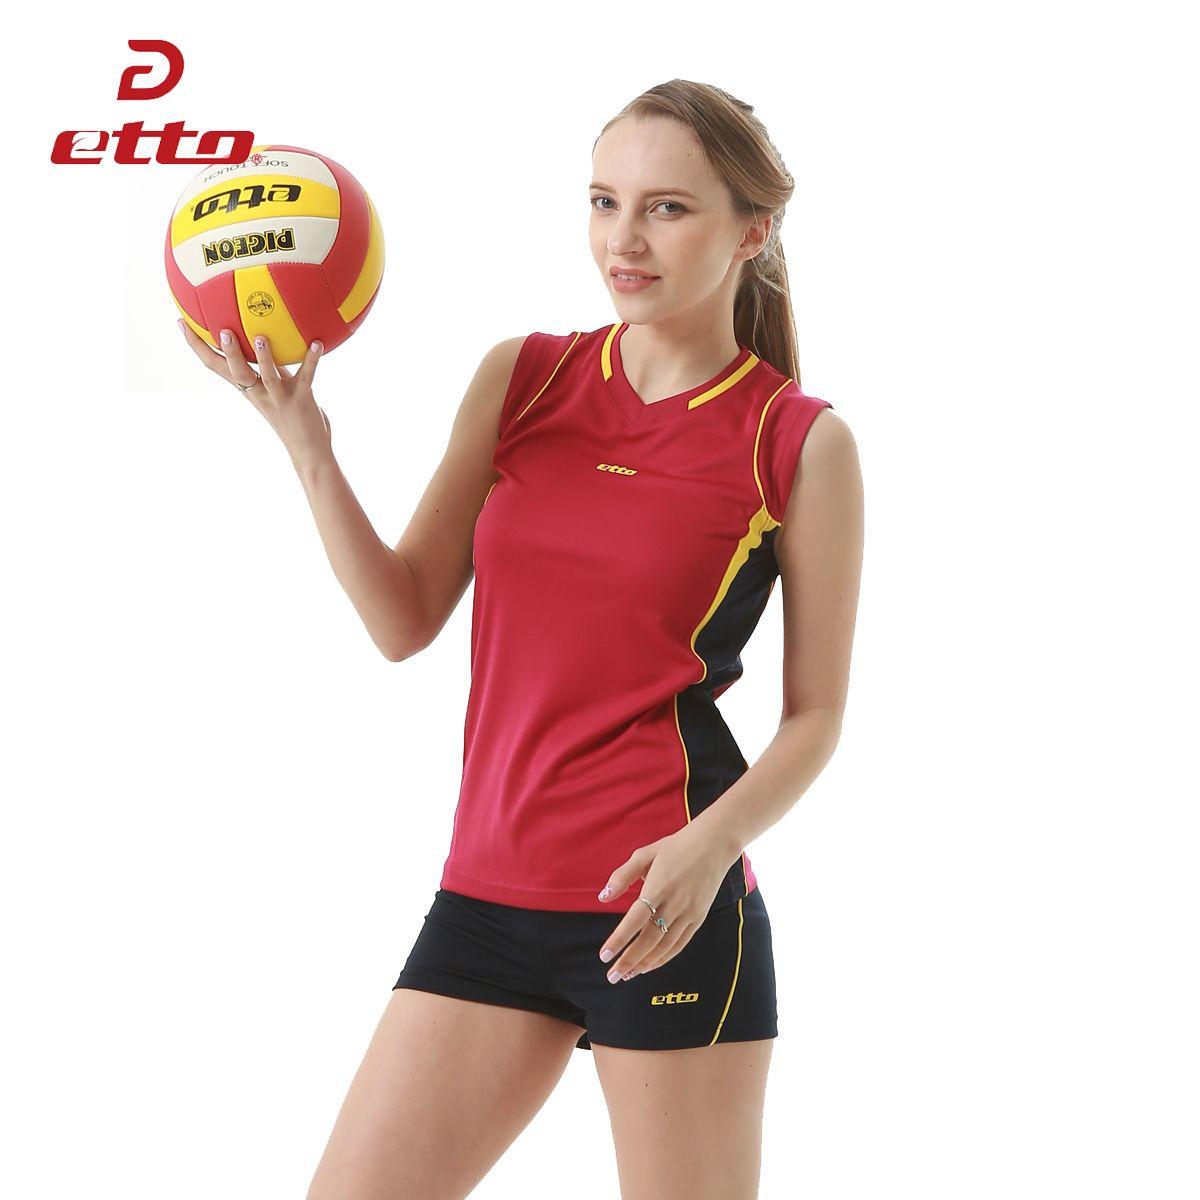 Etto 2016 17 New Professional Women Volleyball Jerseys Uniforms Sportwear Suit Female Volleyball Sleeveless Training Women Volleyball Athletic Tank Tops Women